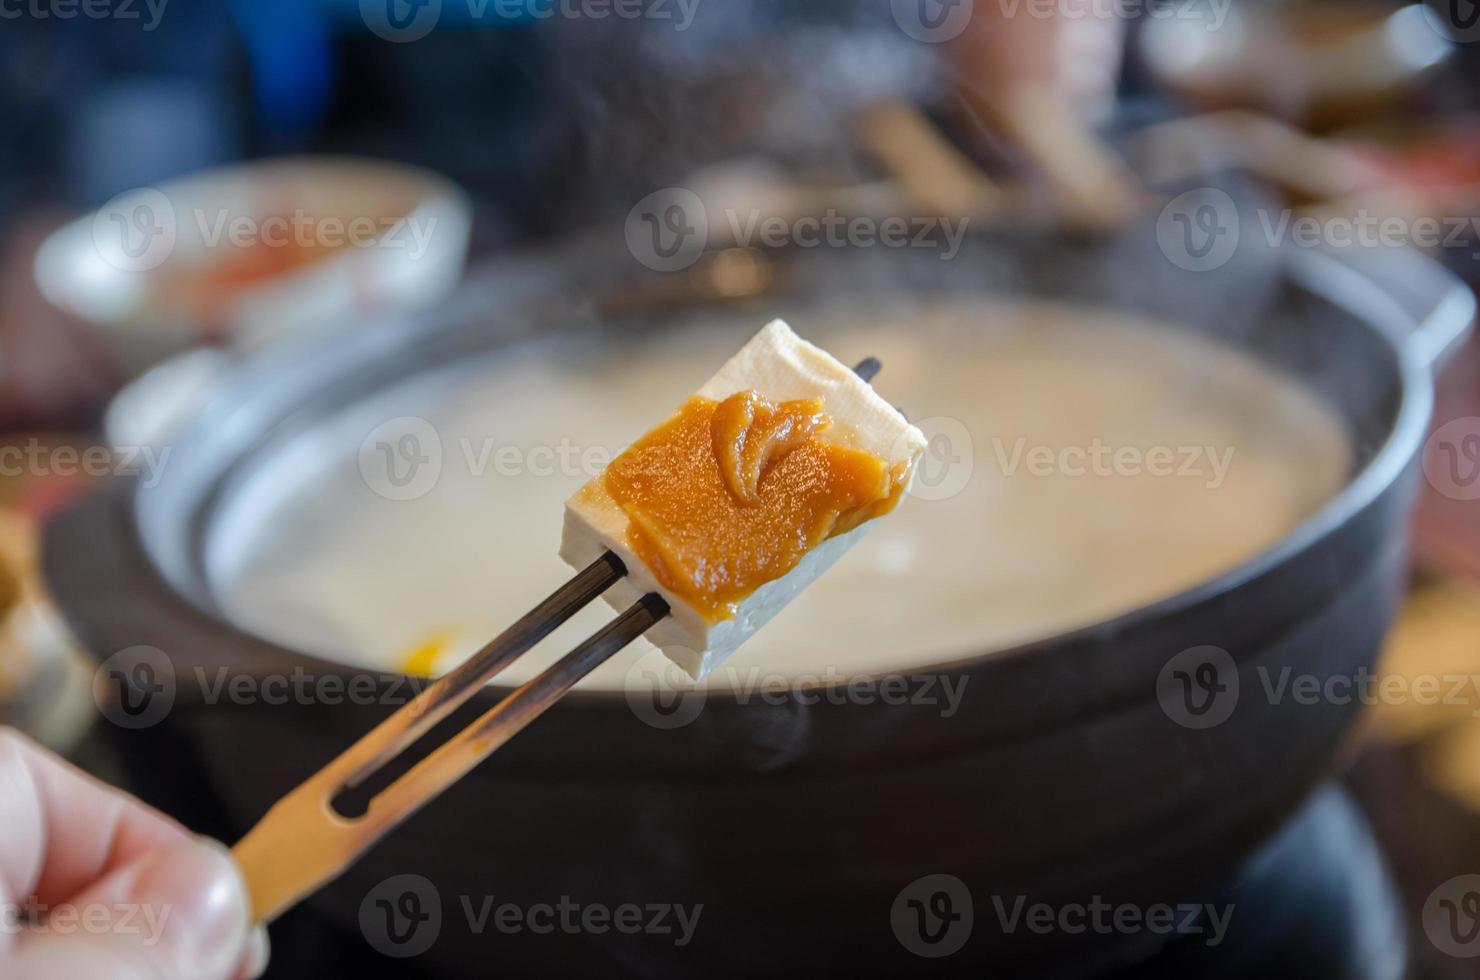 tofu dulce, cuajada de frijoles y mermelada foto